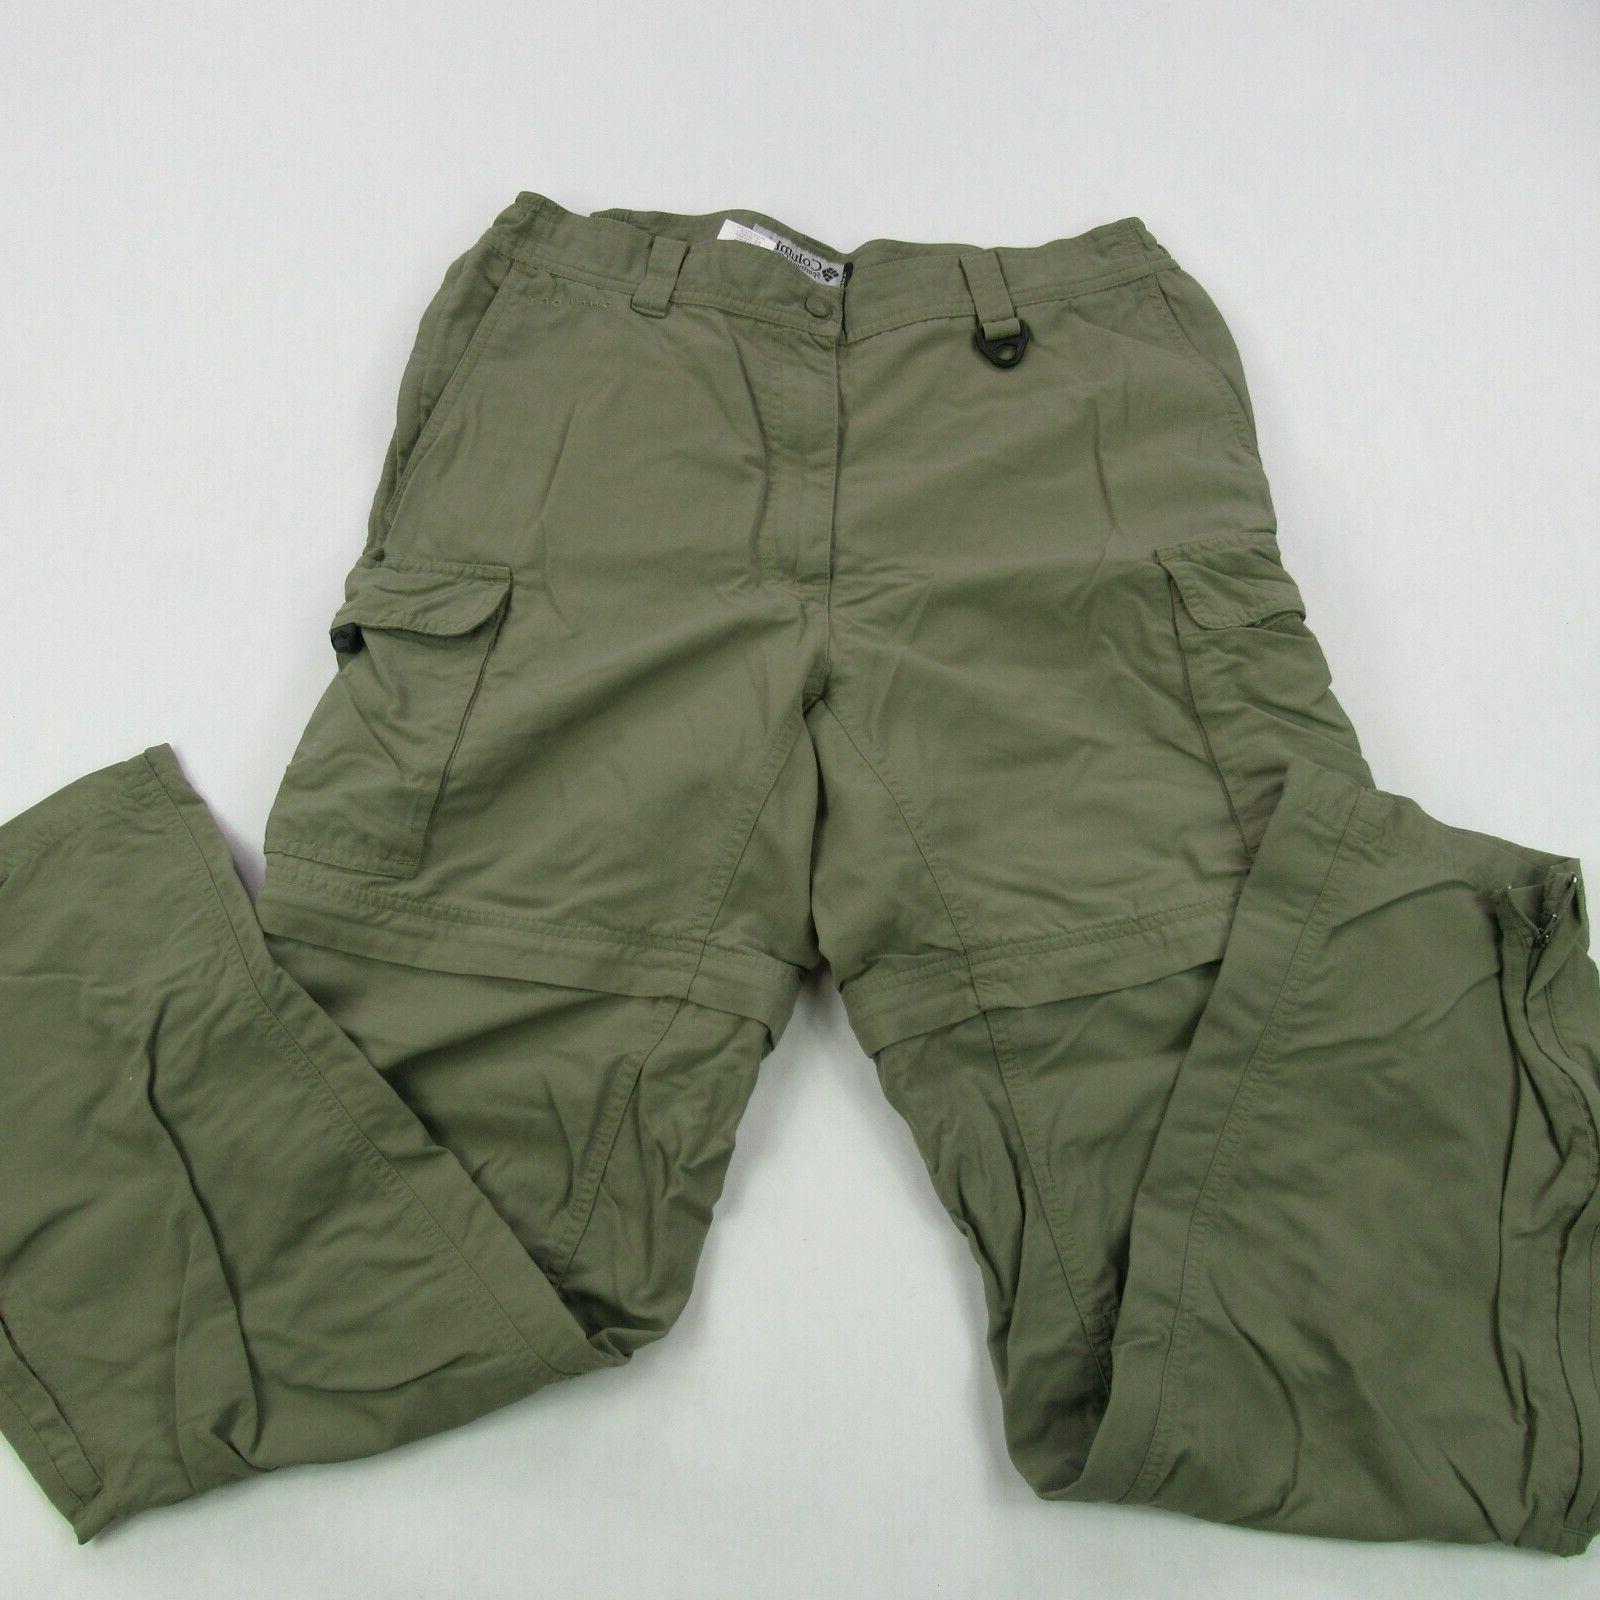 grt mens size medium green cotton cargo